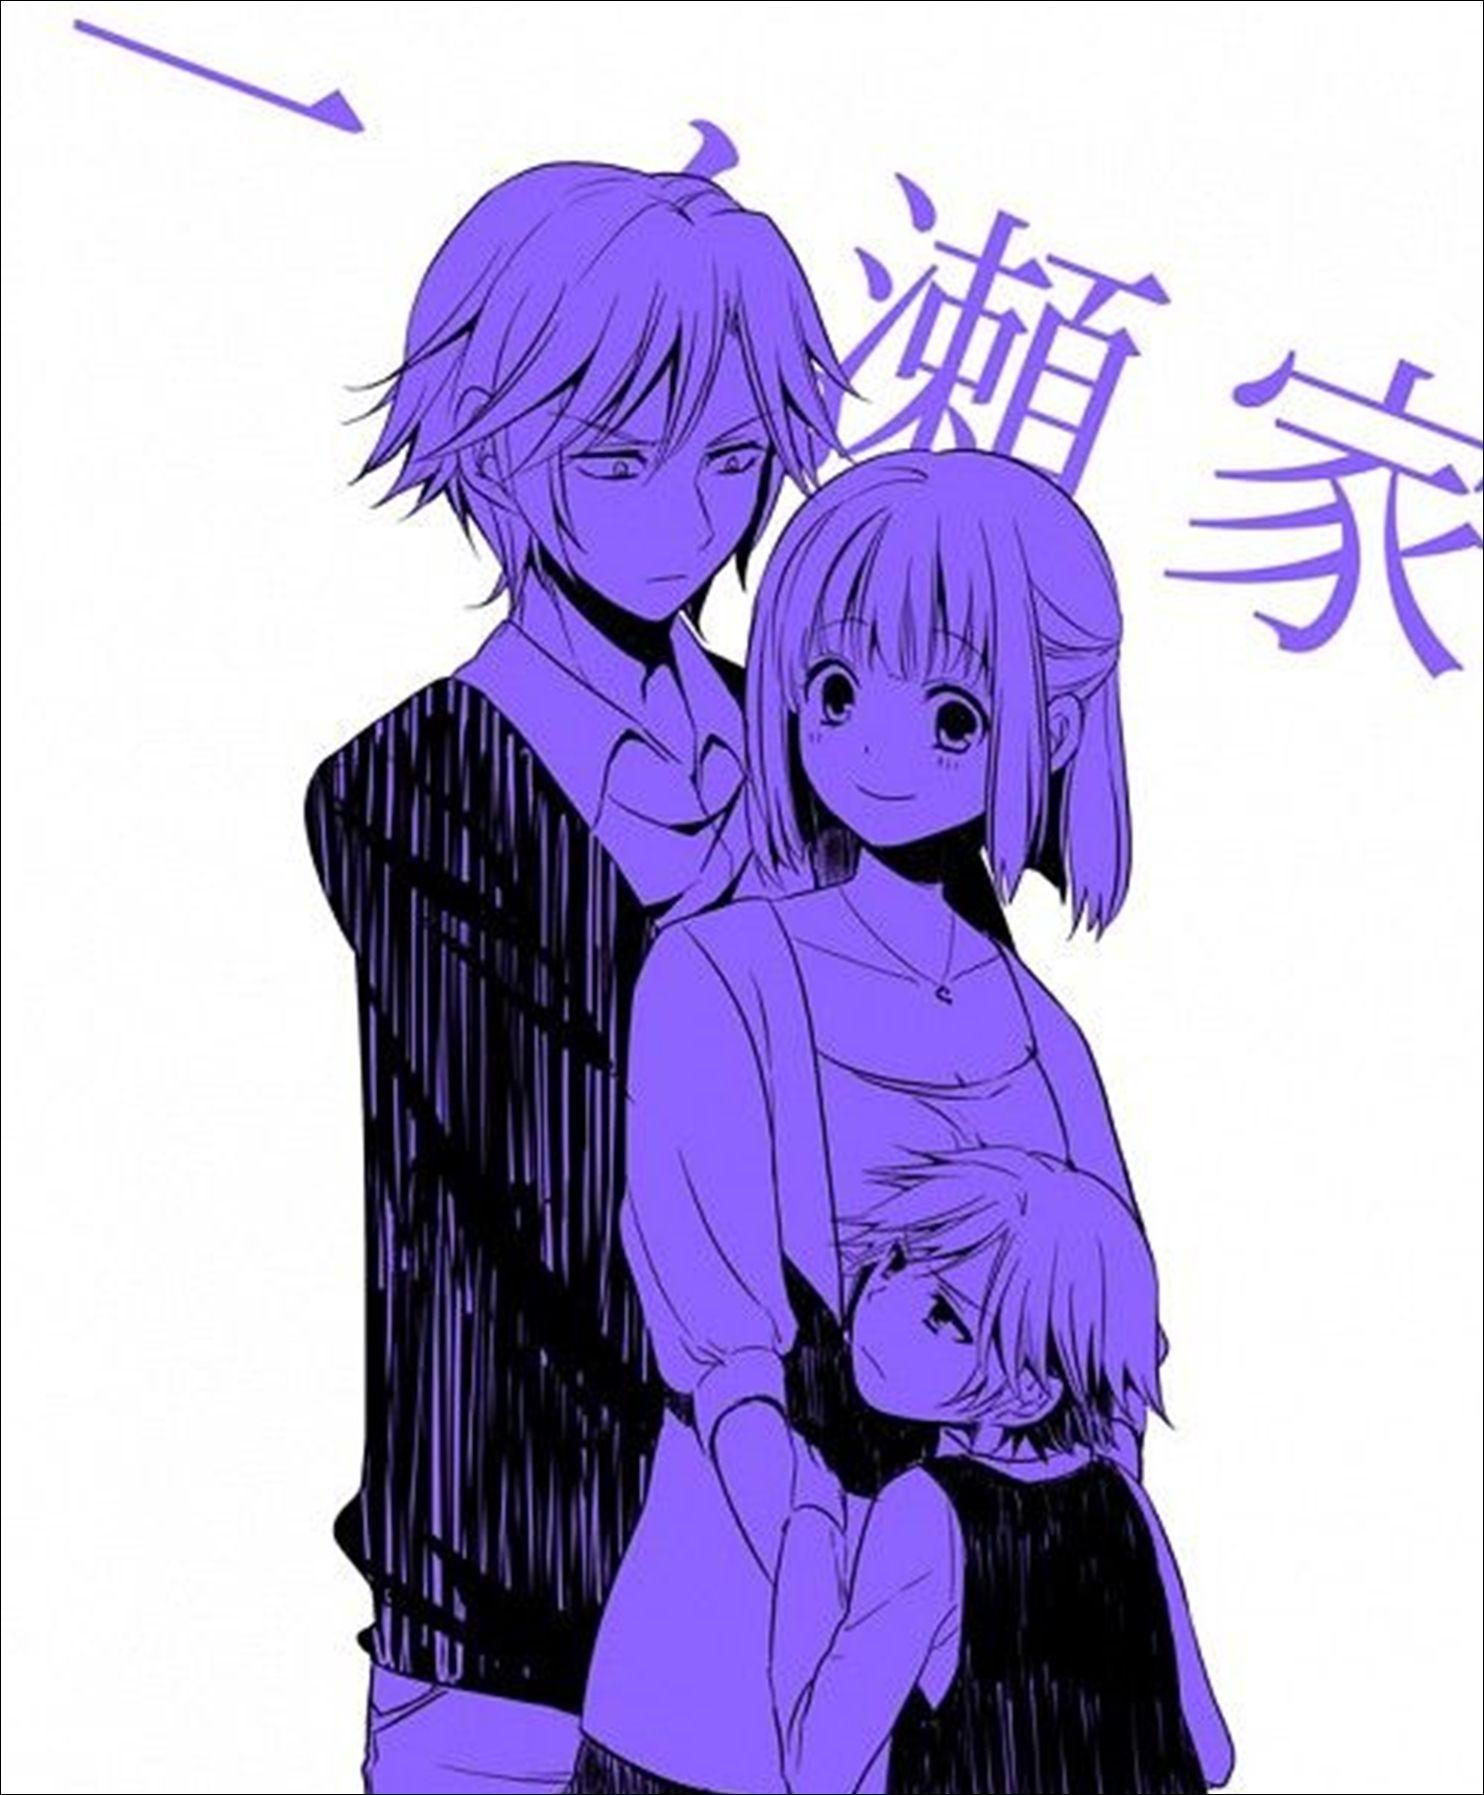 Uta no Prince-sama - Tokiya and Haruka - Family | Uta no ...  Uta No Prince Sama Haruka And Tokiya Lemon